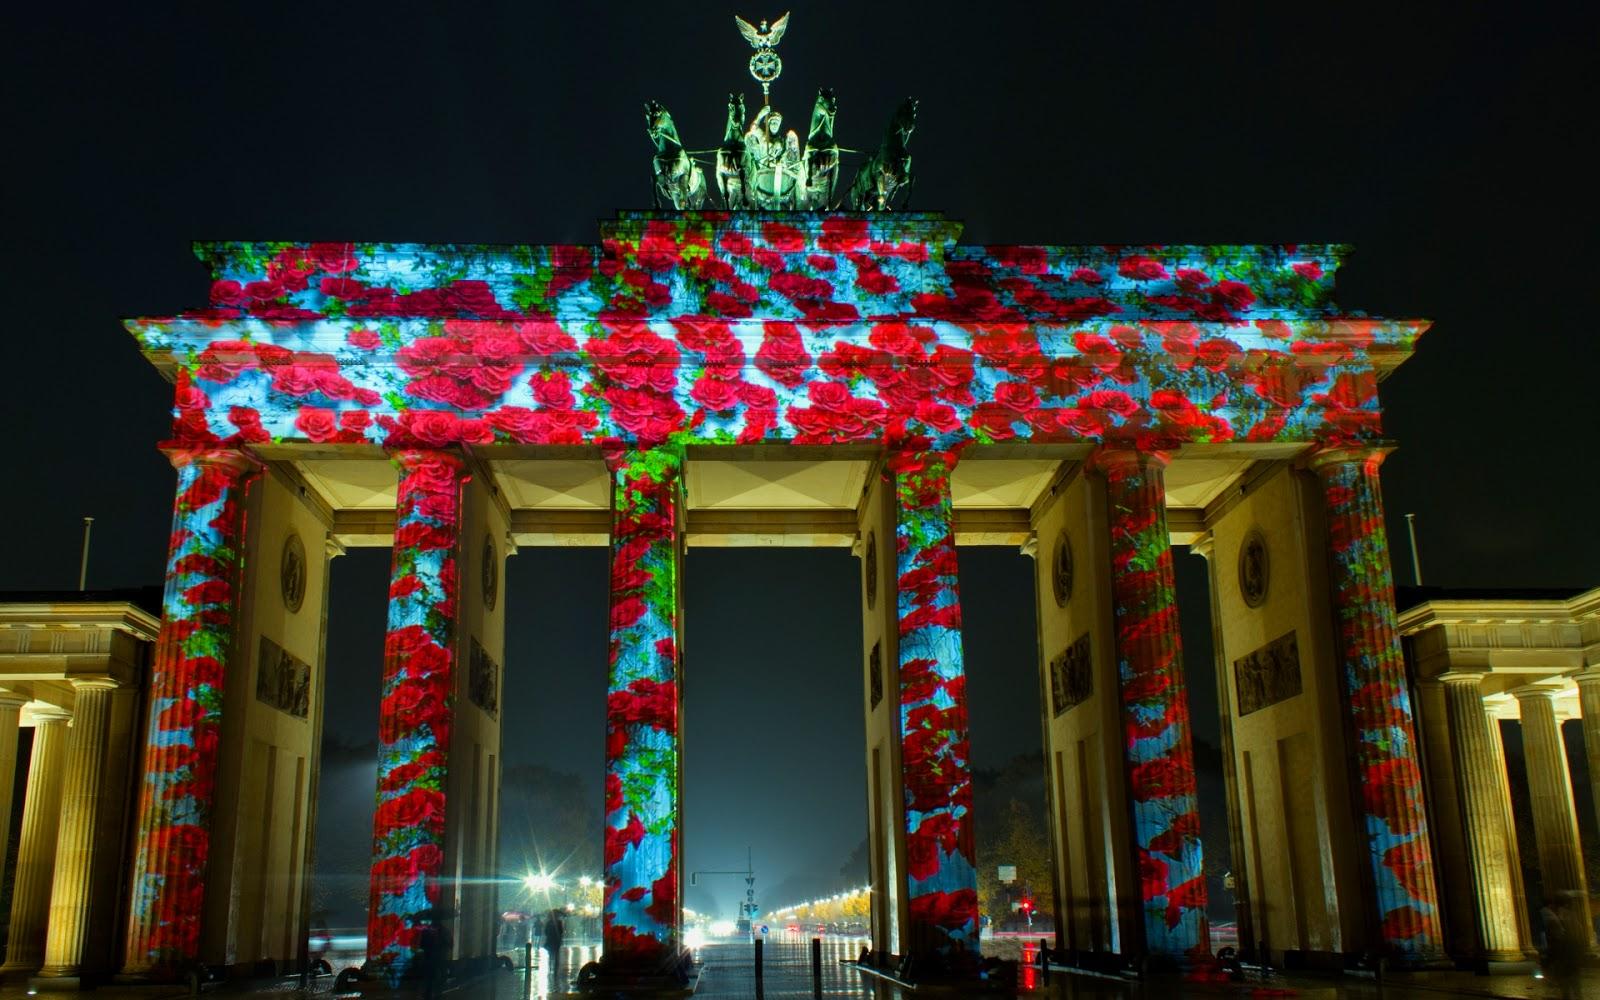 artistic festival of lights berlin hd wallpaper ~ hyip bitz - hyip